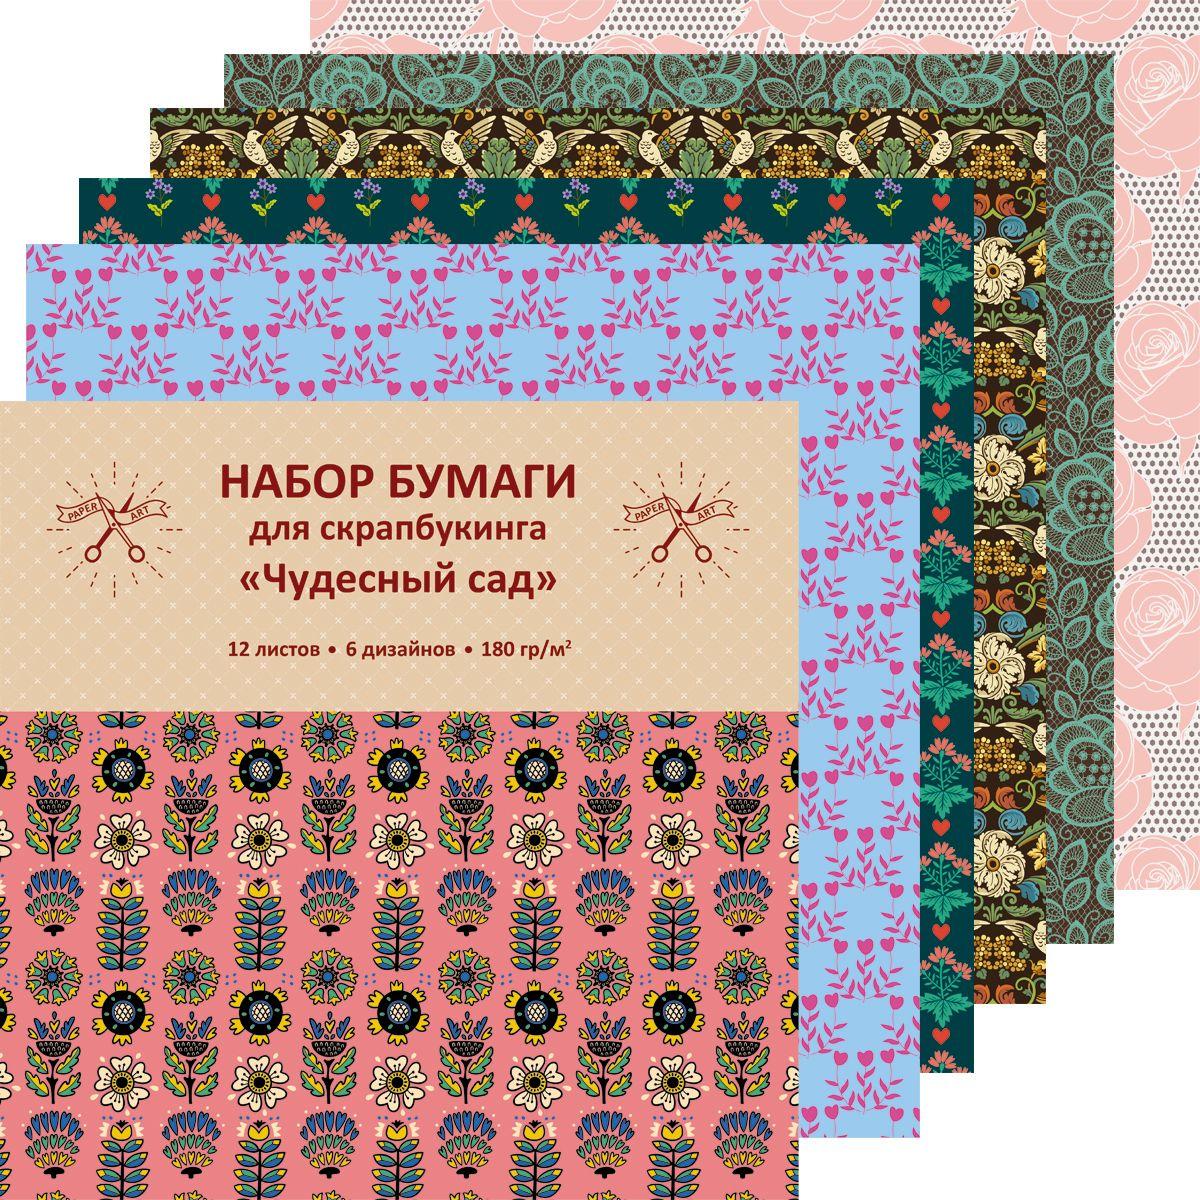 Канц-Эксмо Бумага для скрапбукинга Чудный сад 330 х 330 мм бумага для скрапбукинга двусторонняя prima marketing parfait